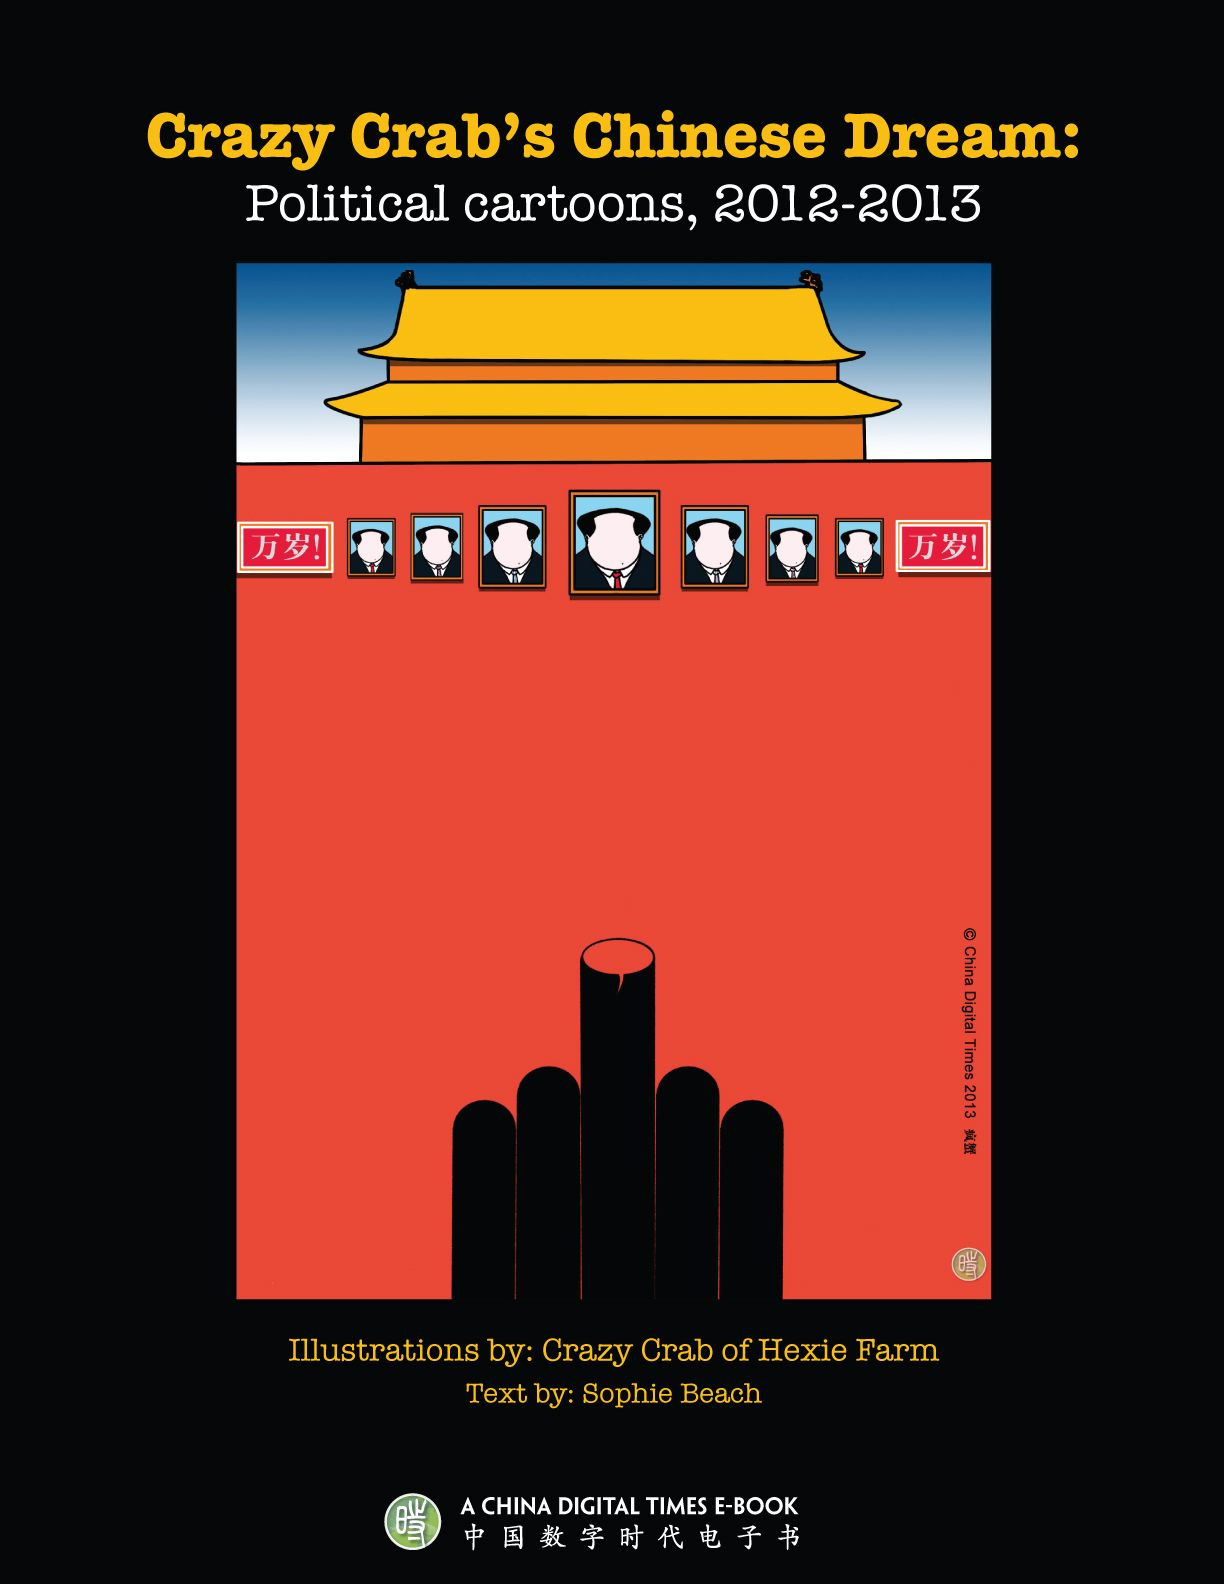 Crazy Crab's Chinese Dream: Political Cartoons, 2012-2013